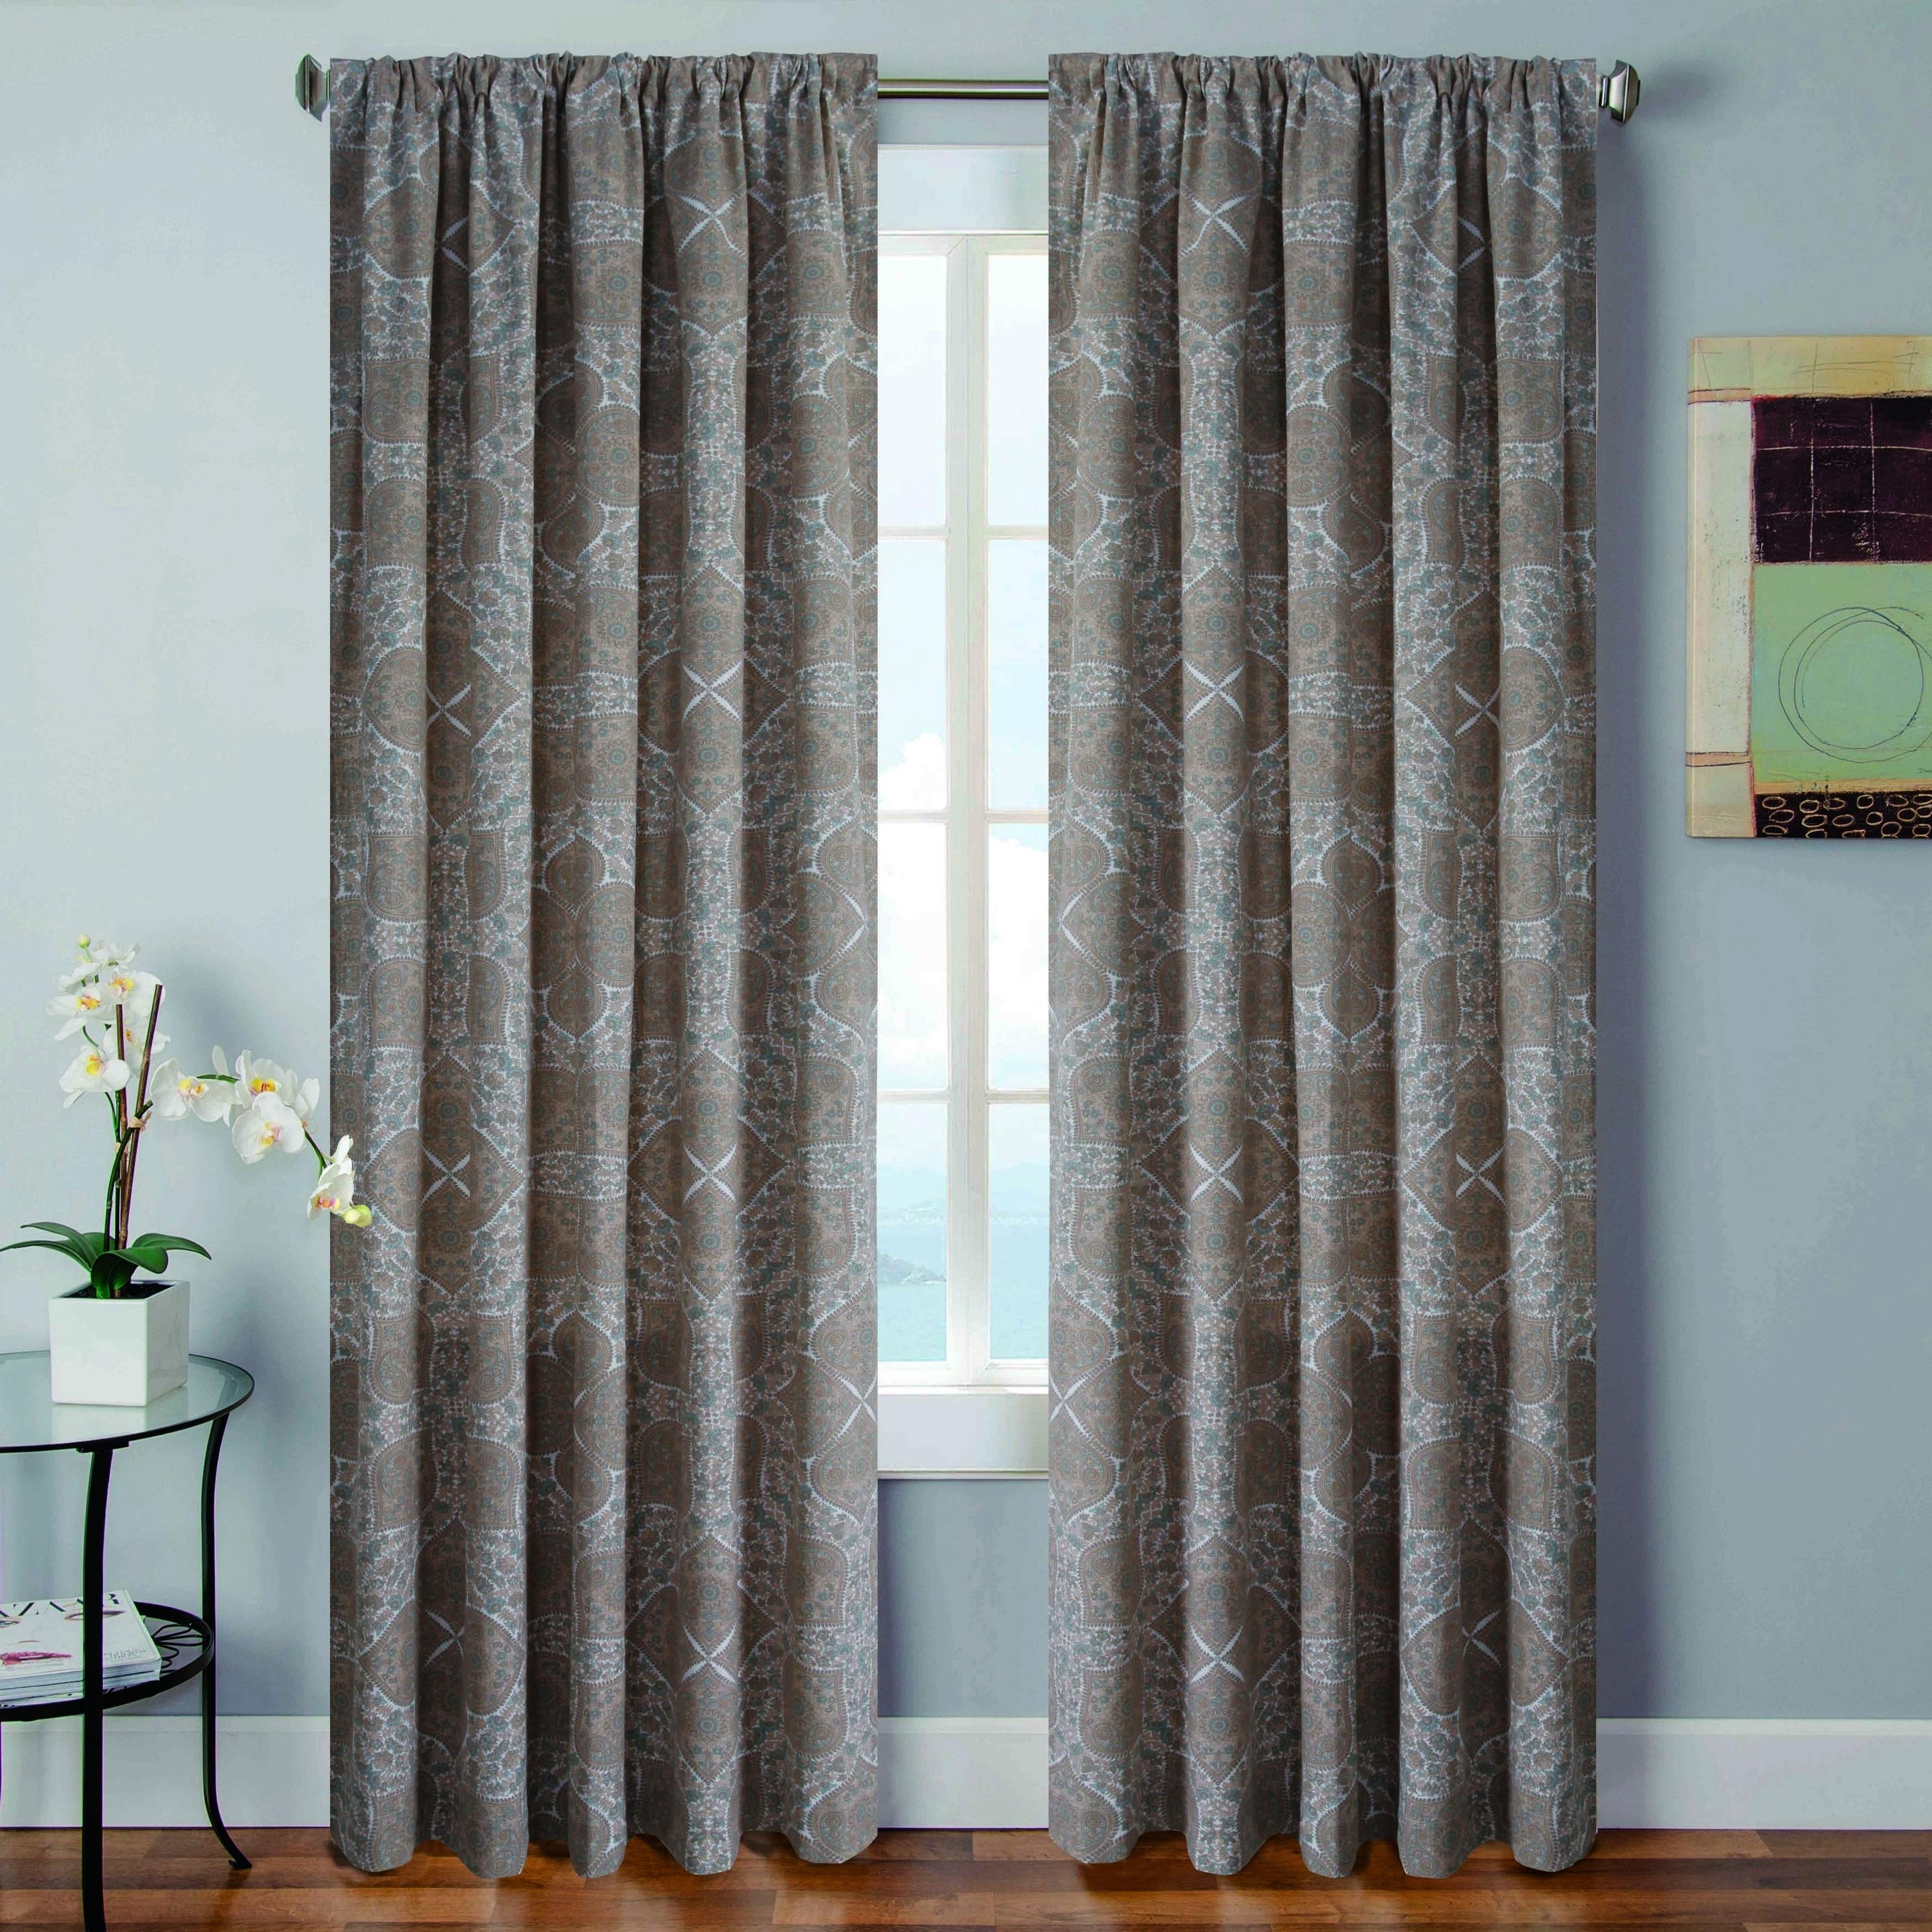 Vera Tarah 96 Inch Curtain Panel Pair 52x96